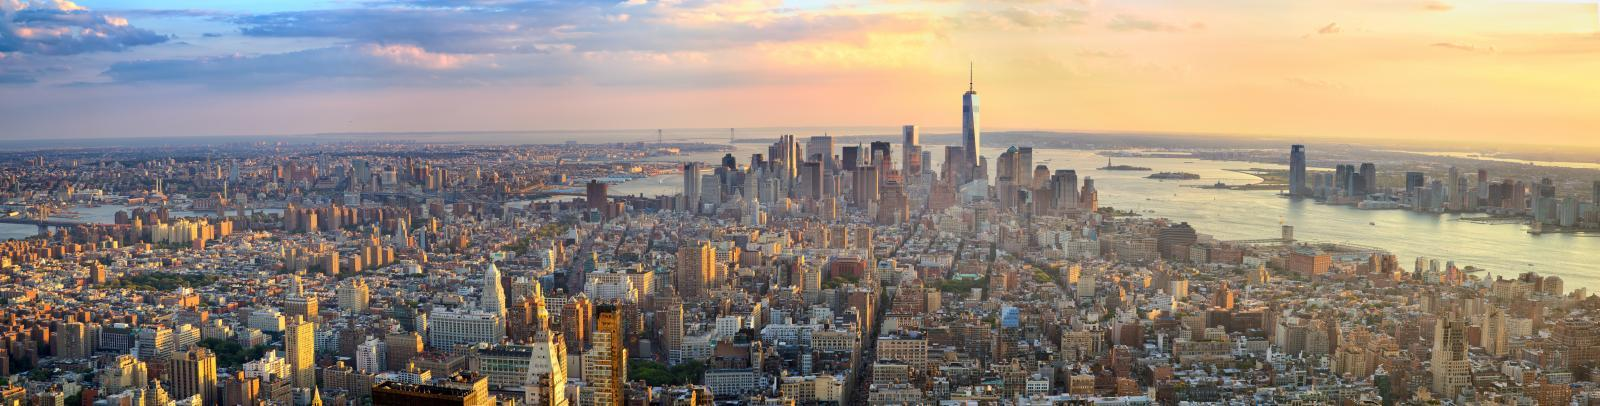 NYC Pass Comparison Skyline